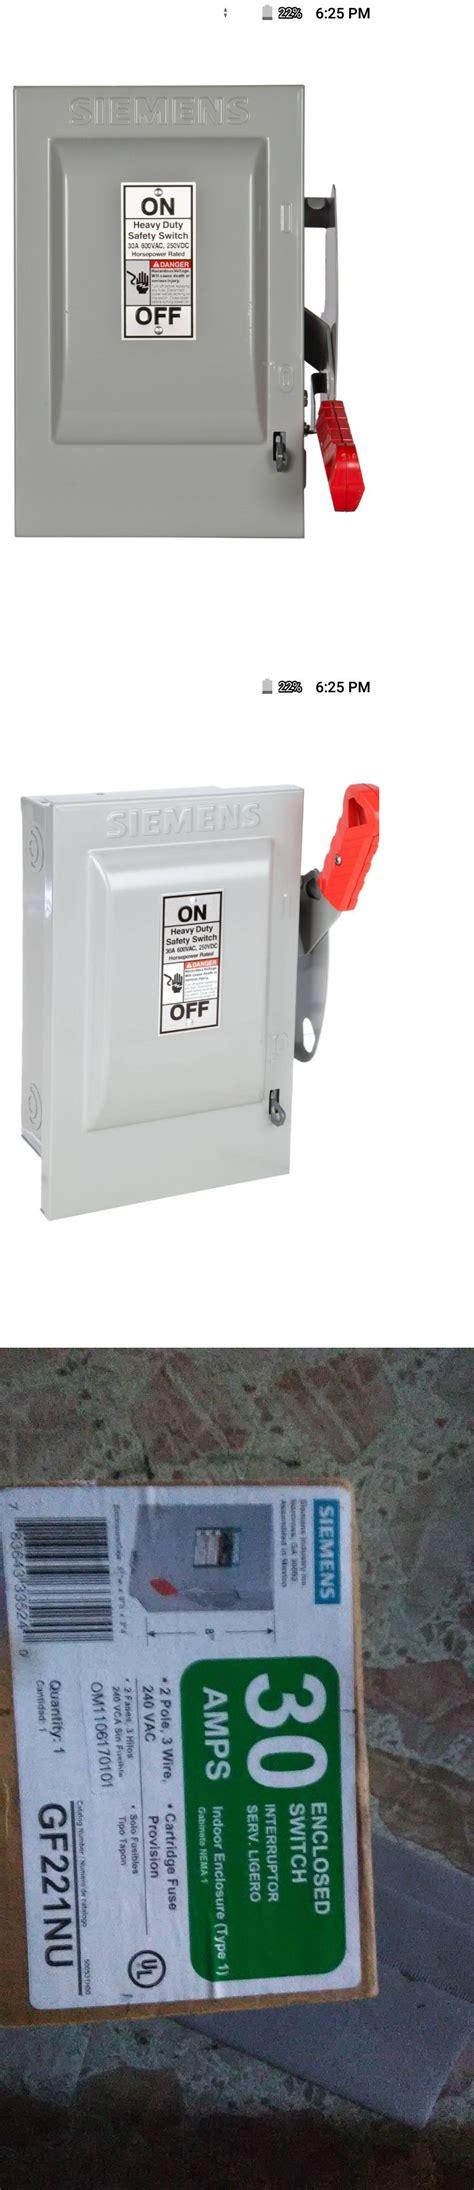 circuit breakers  fuse boxes  siemens  amp  pole  wire circuit breaker box